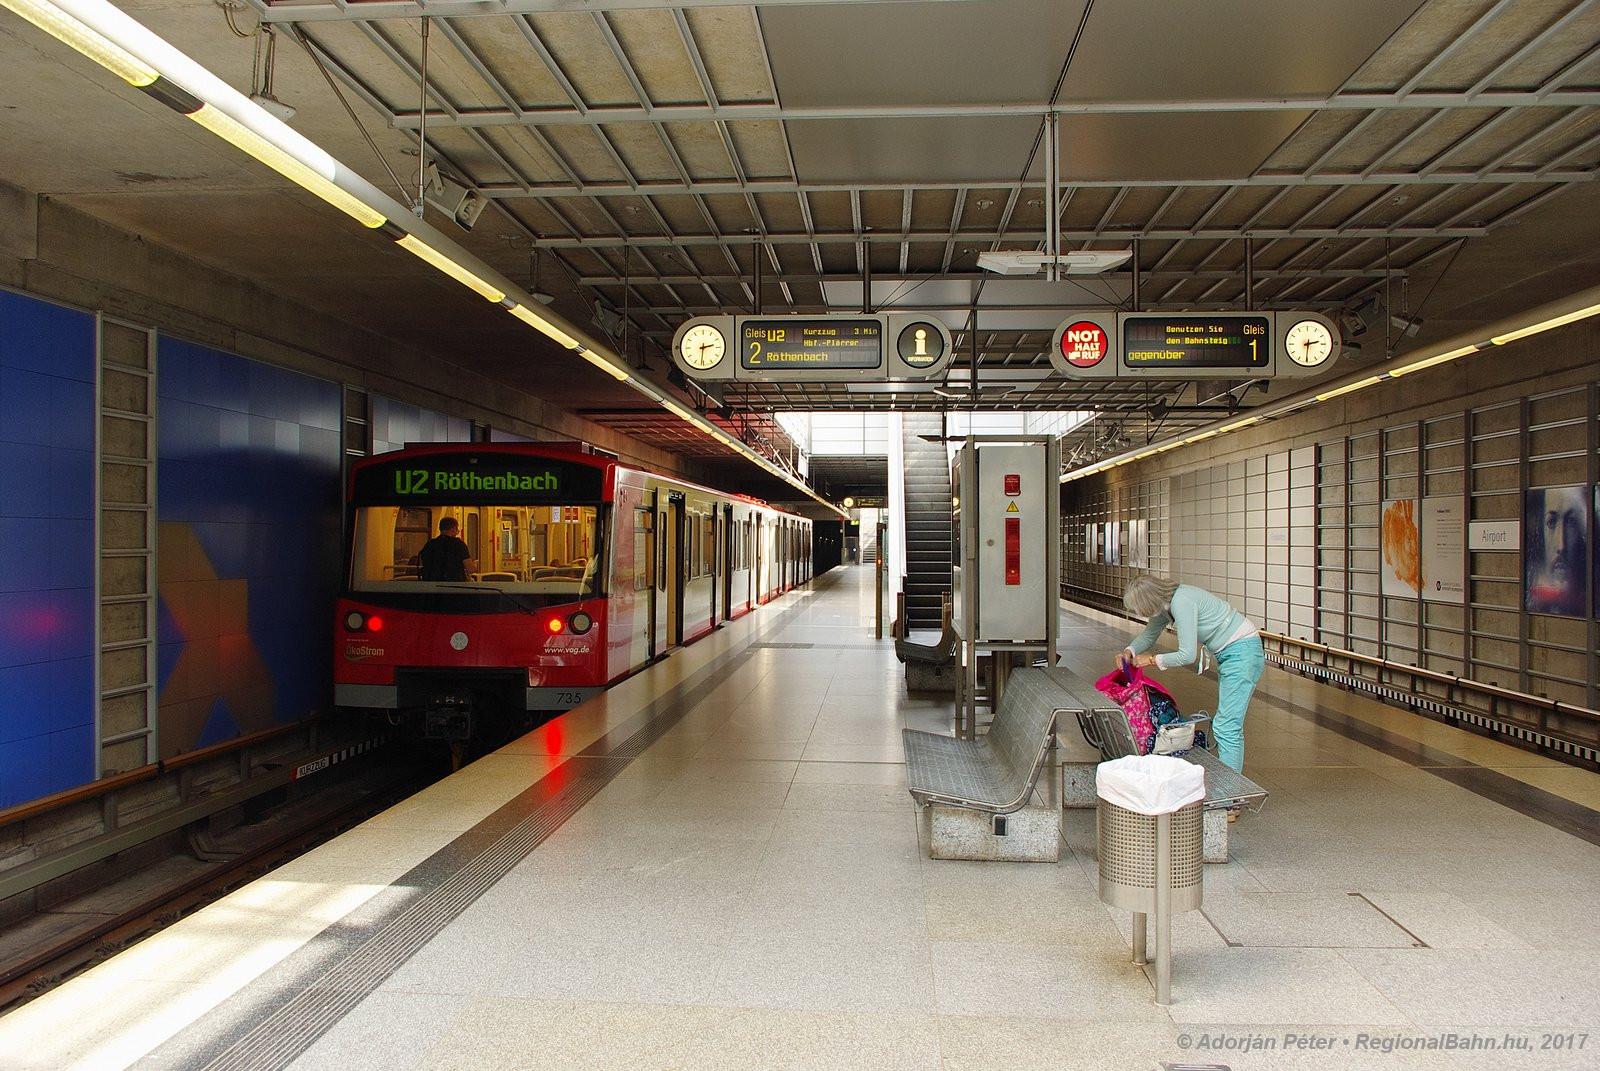 regionalbahn u bahn n rnberg az innovat v metr h l zat. Black Bedroom Furniture Sets. Home Design Ideas